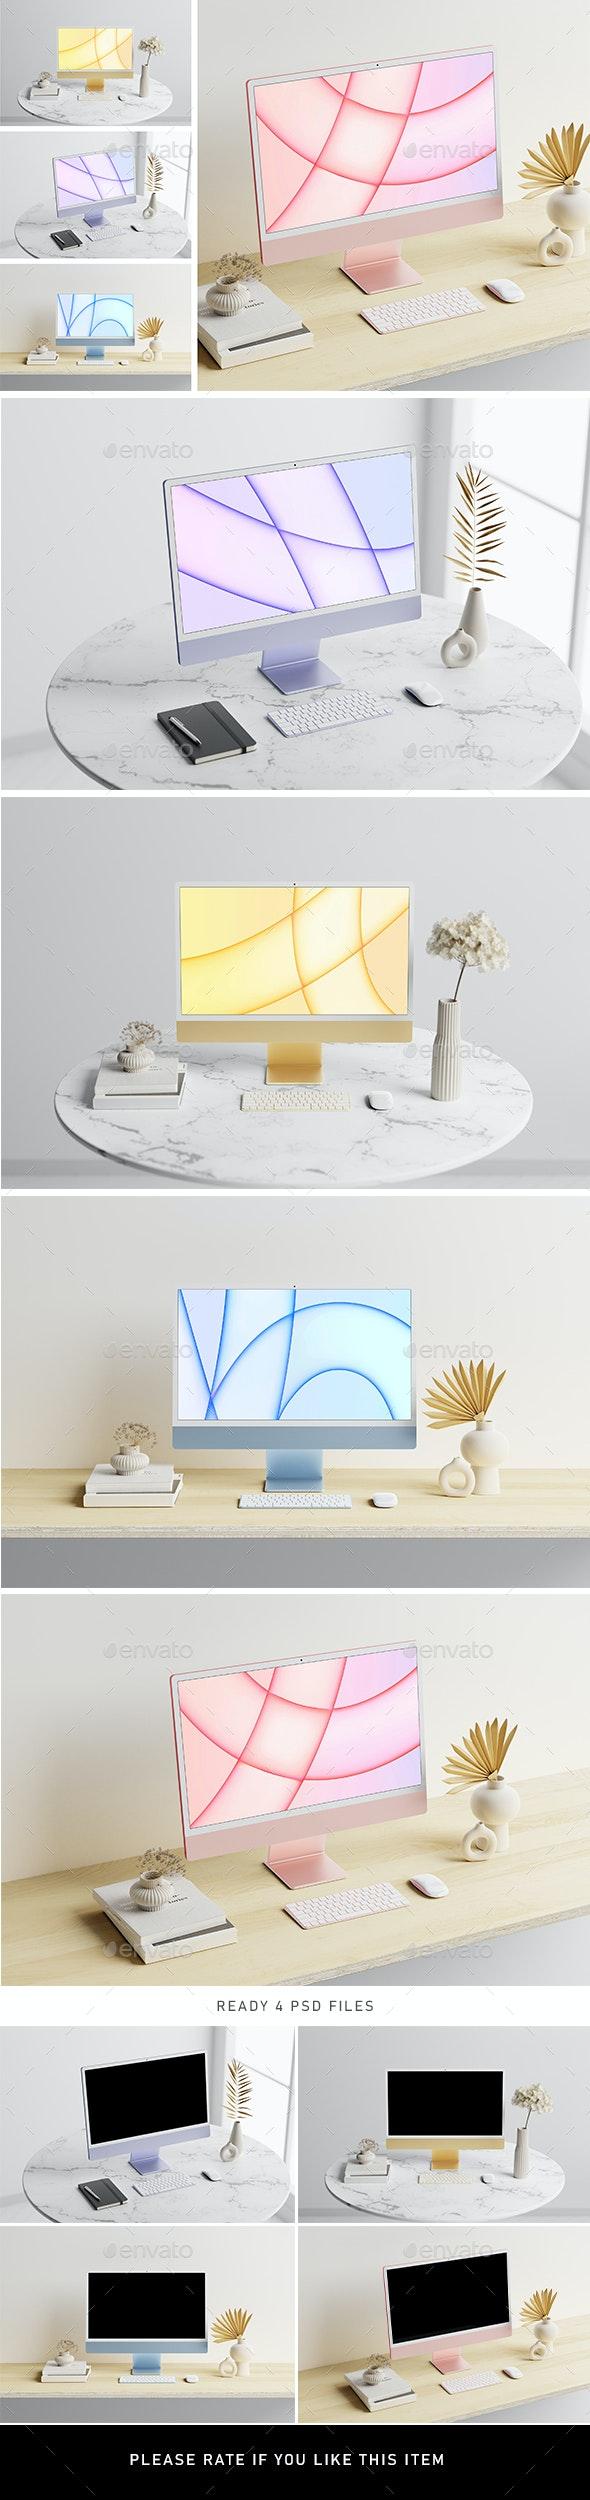 iMac M1 Responsive Mockup - Displays Product Mock-Ups